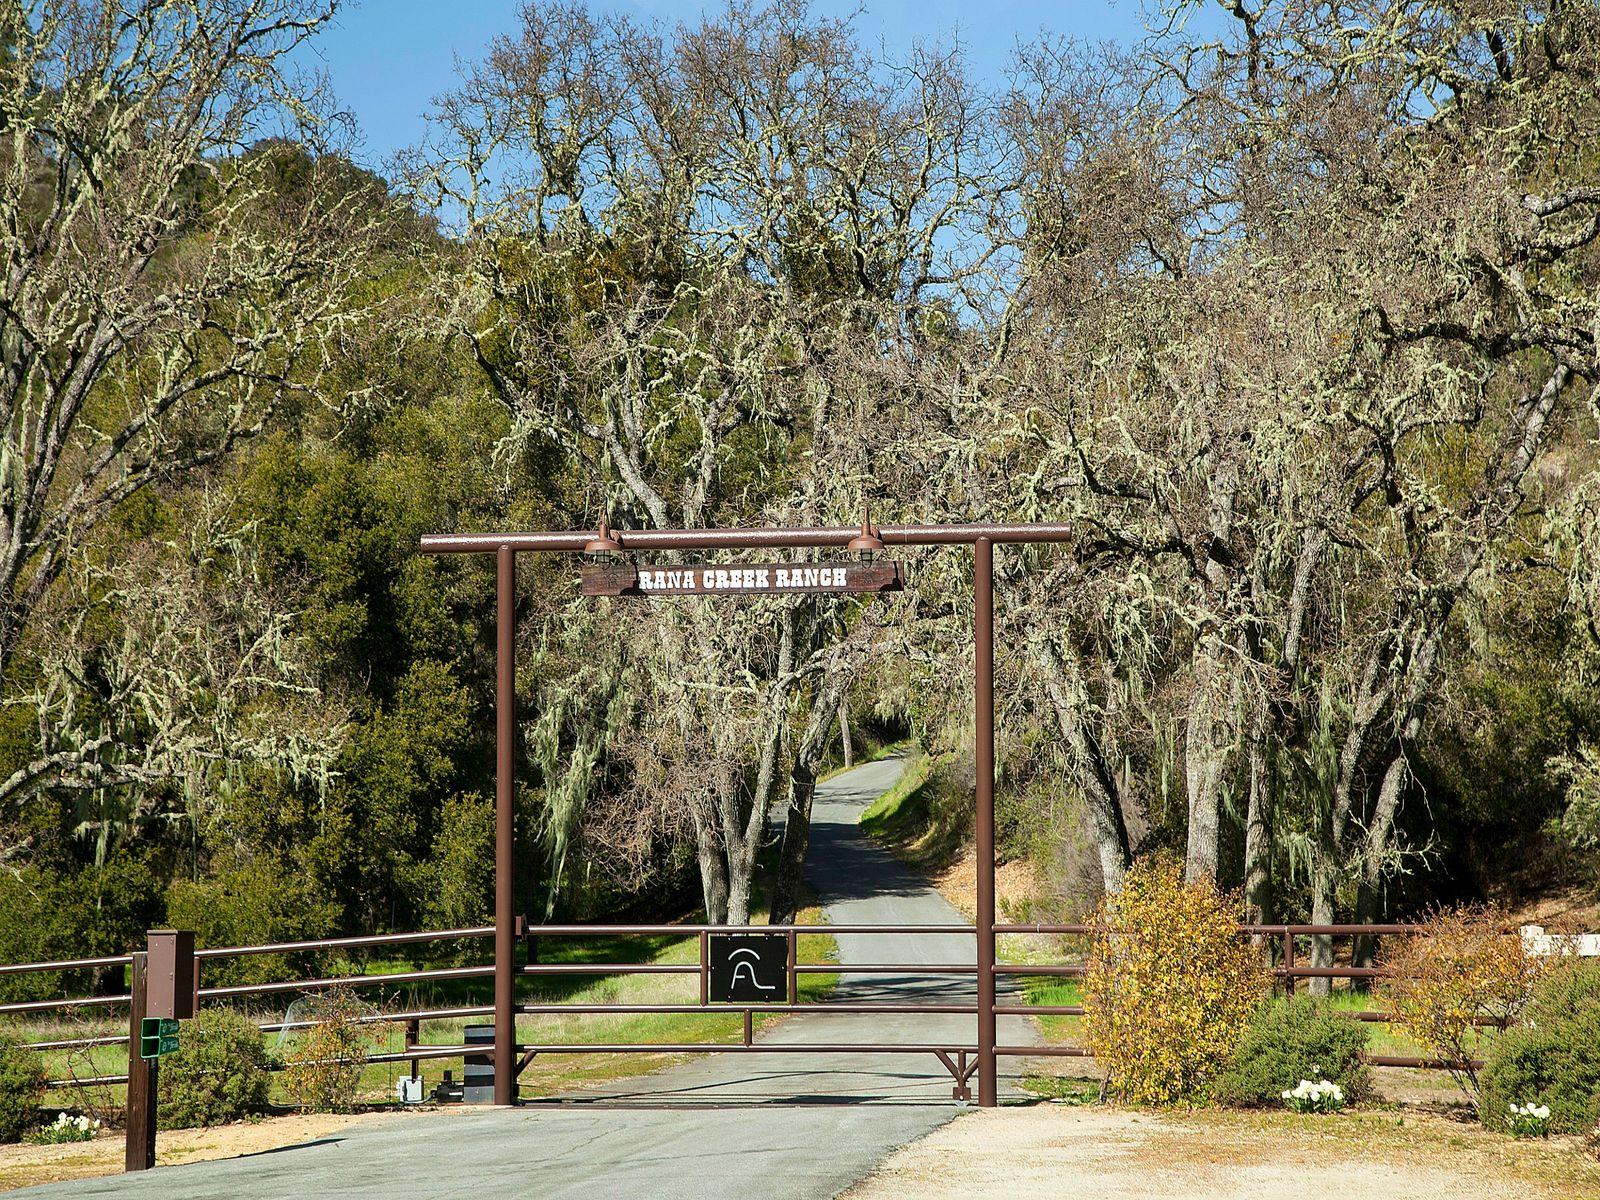 Rana Creek Ranch